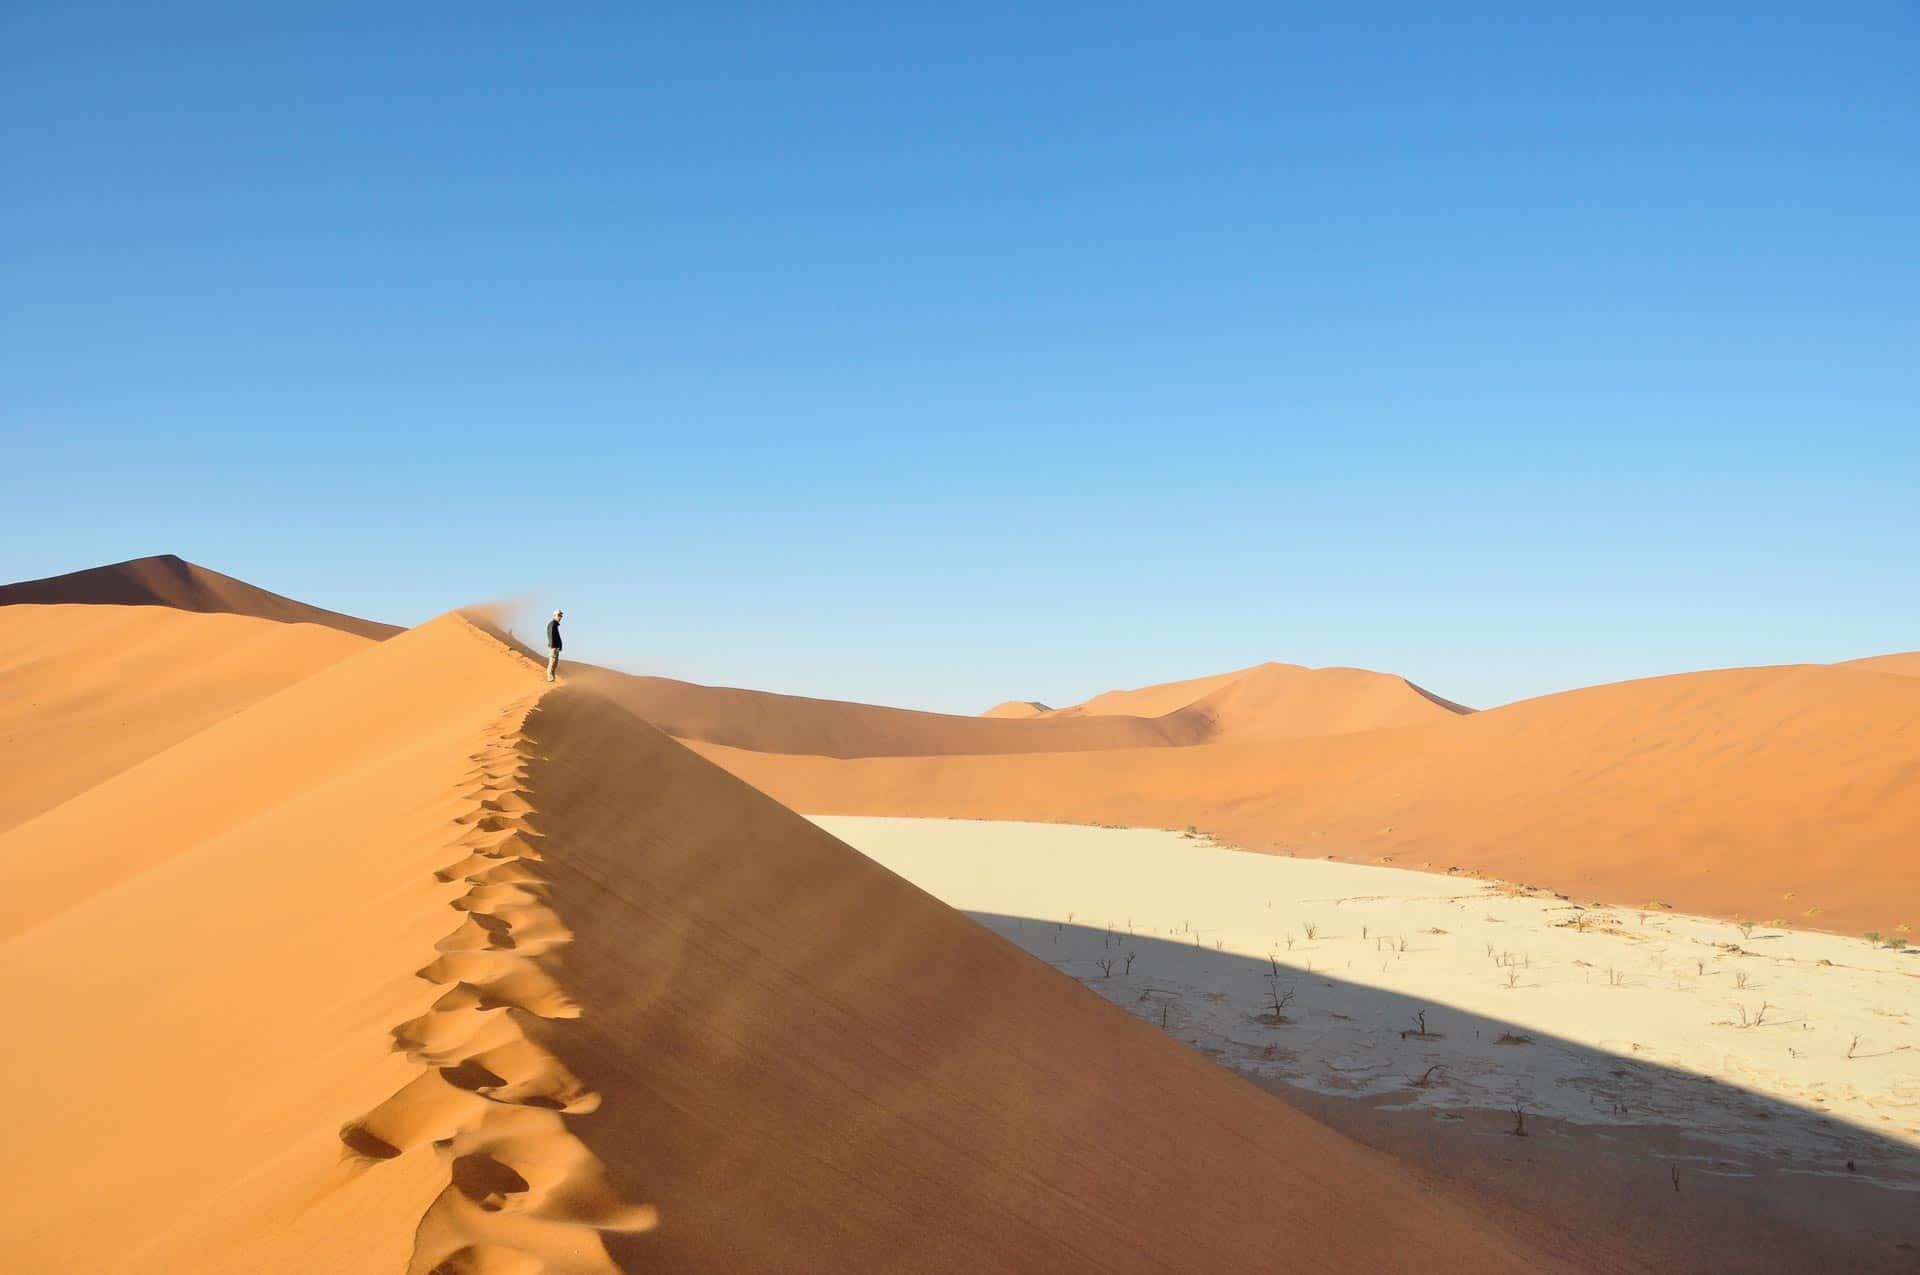 Sossuvlei-Wueste-Namib-Namibia-Globetrotter-Select-18